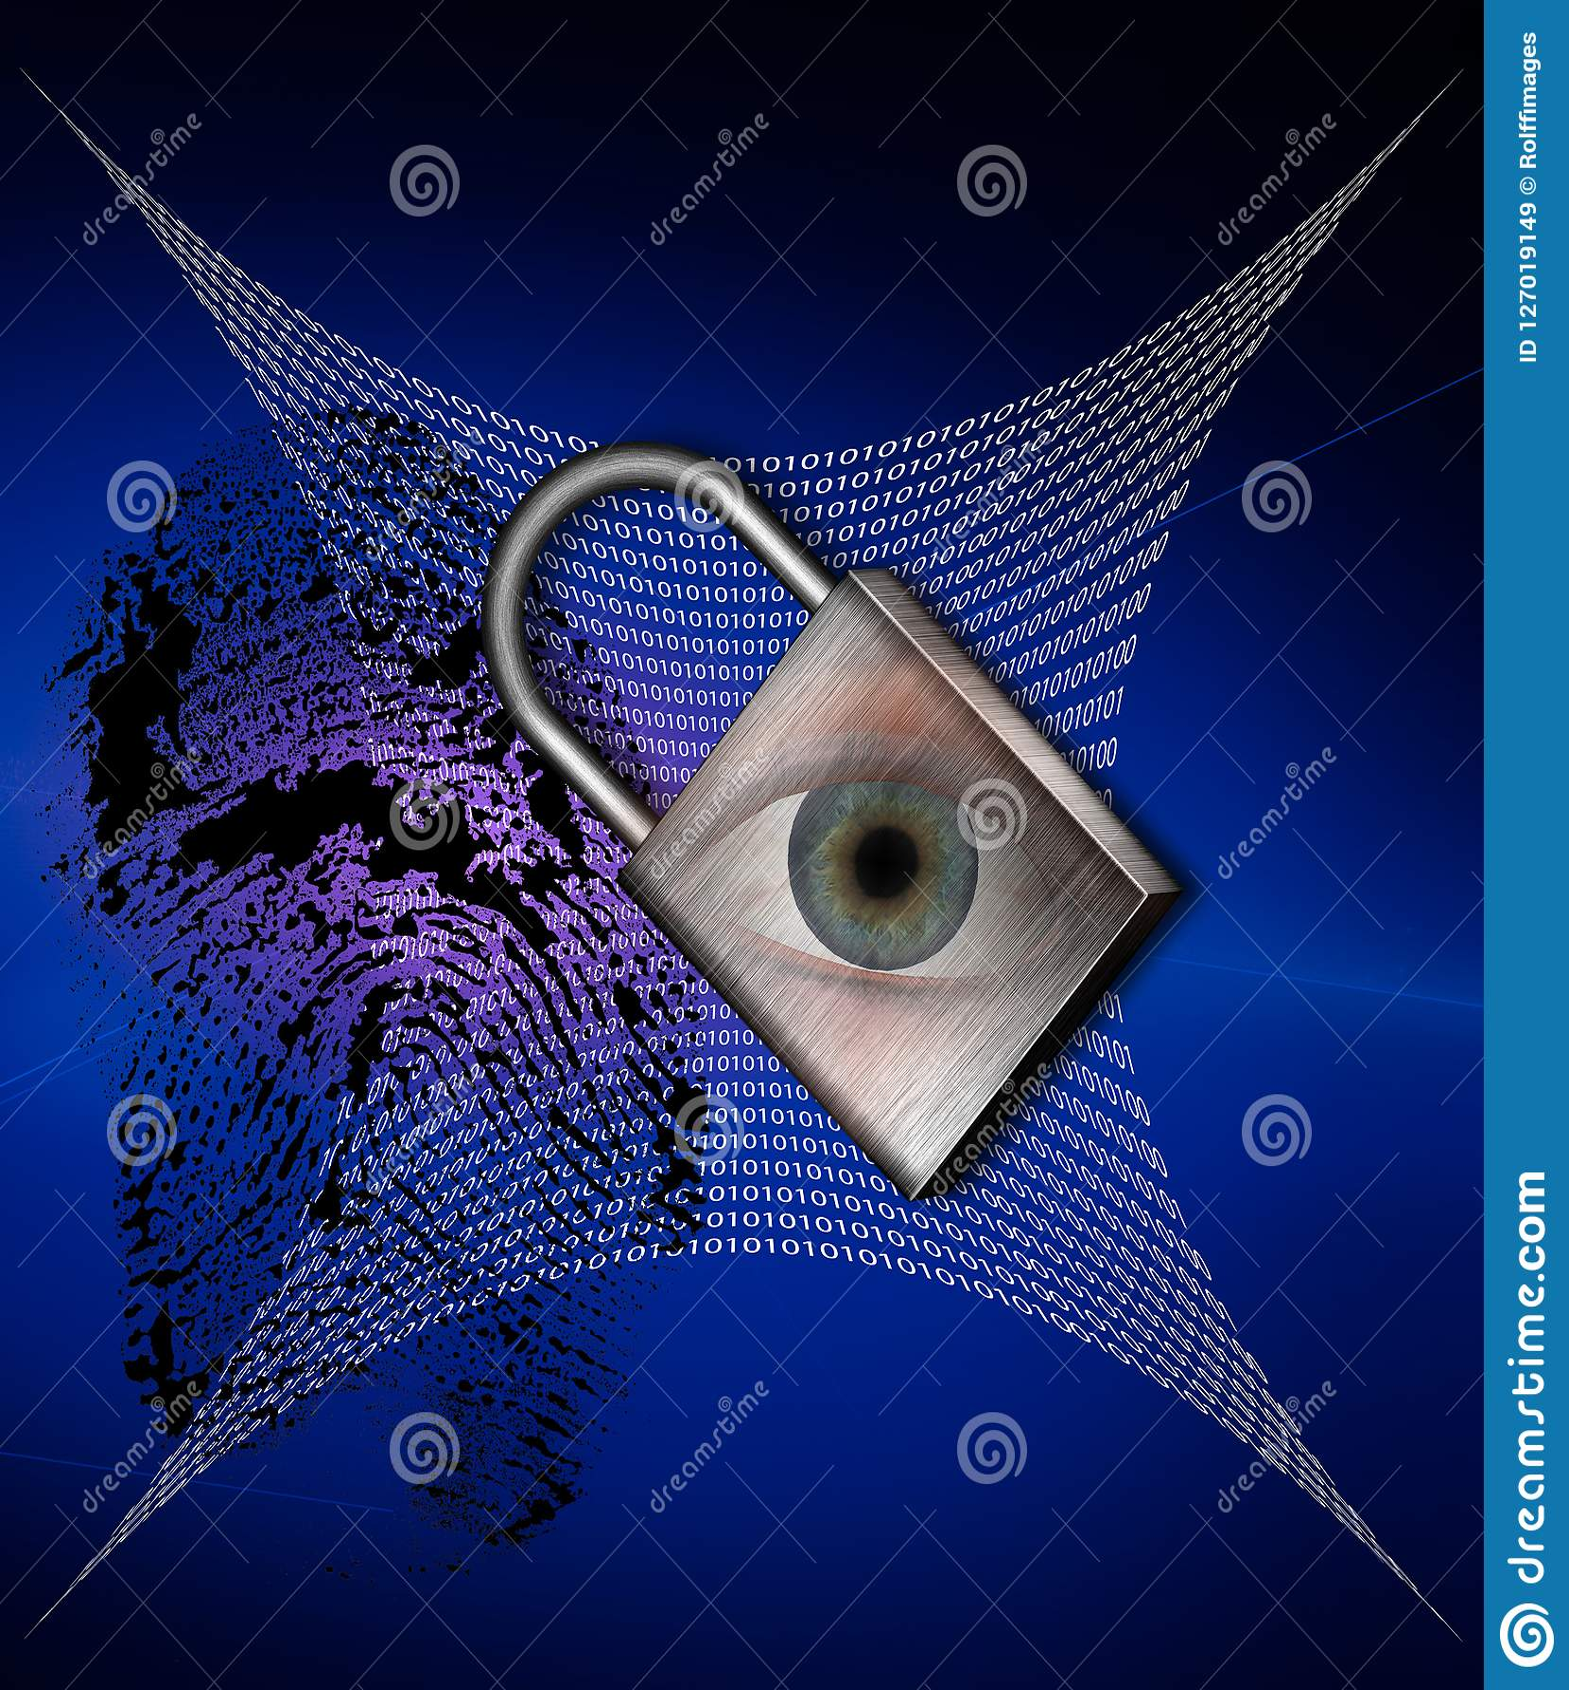 Technology Security Stock Illustration  Illustration Of